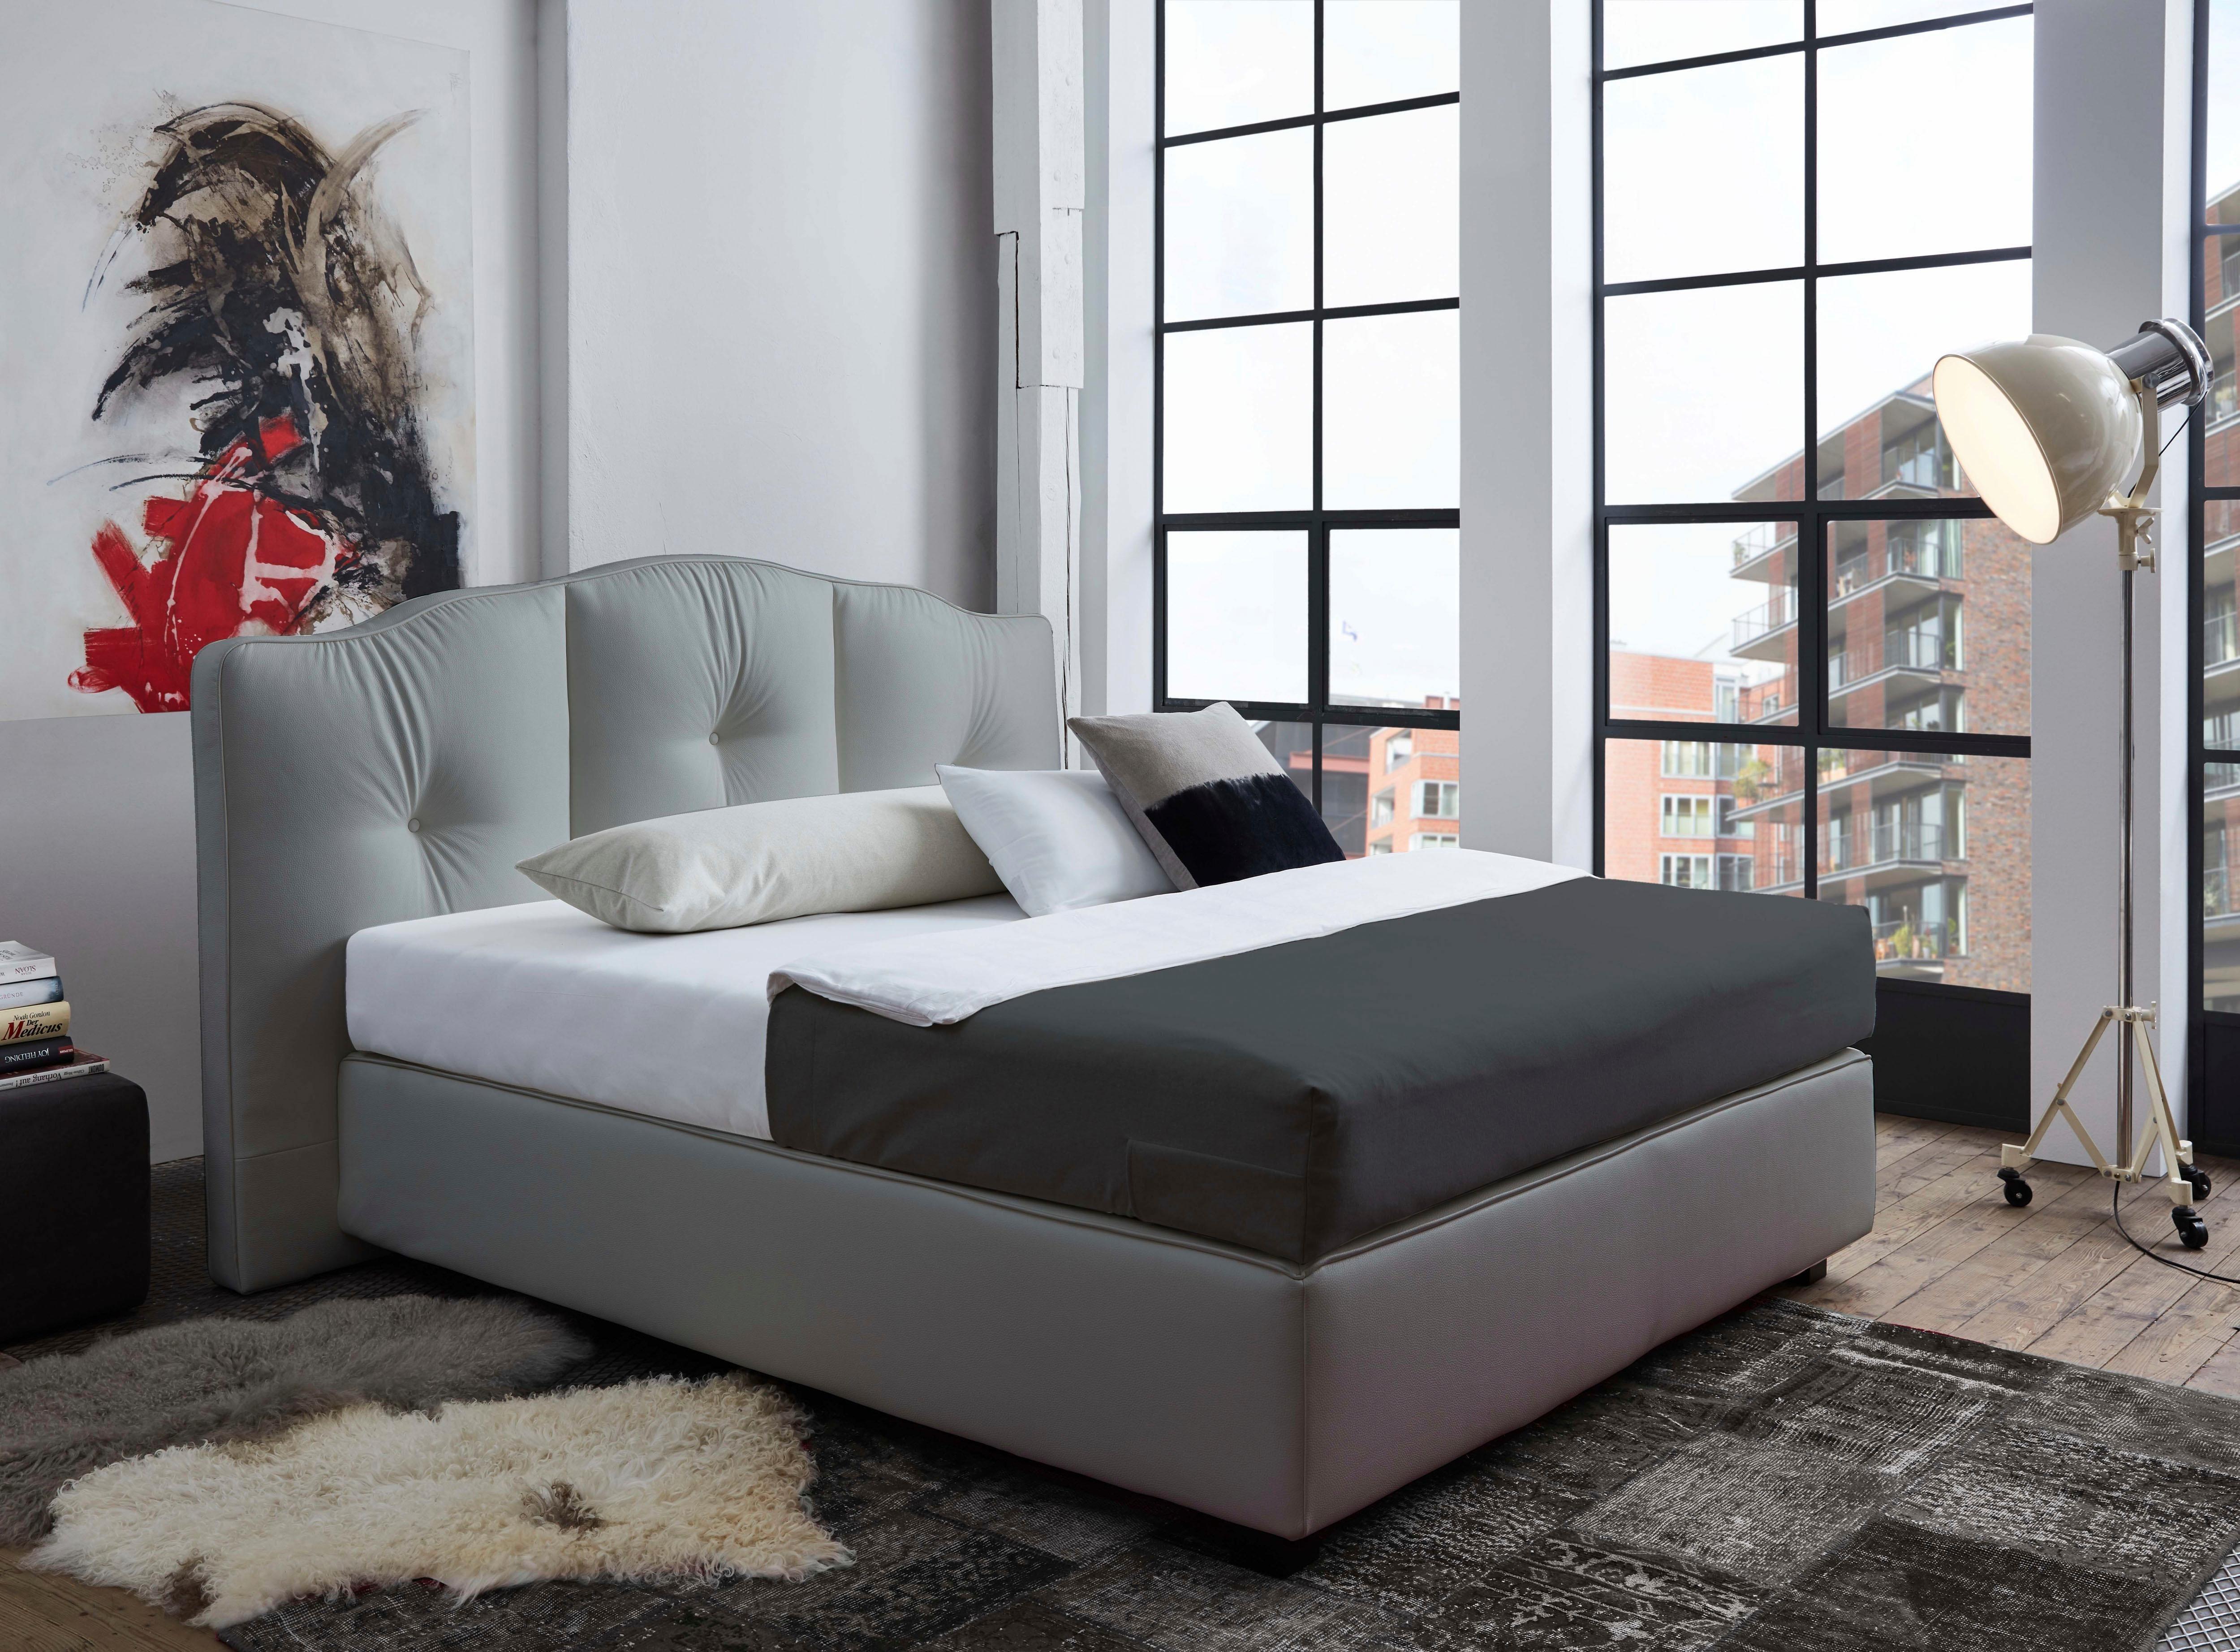 places of style boxspringbetten online kaufen m bel suchmaschine. Black Bedroom Furniture Sets. Home Design Ideas